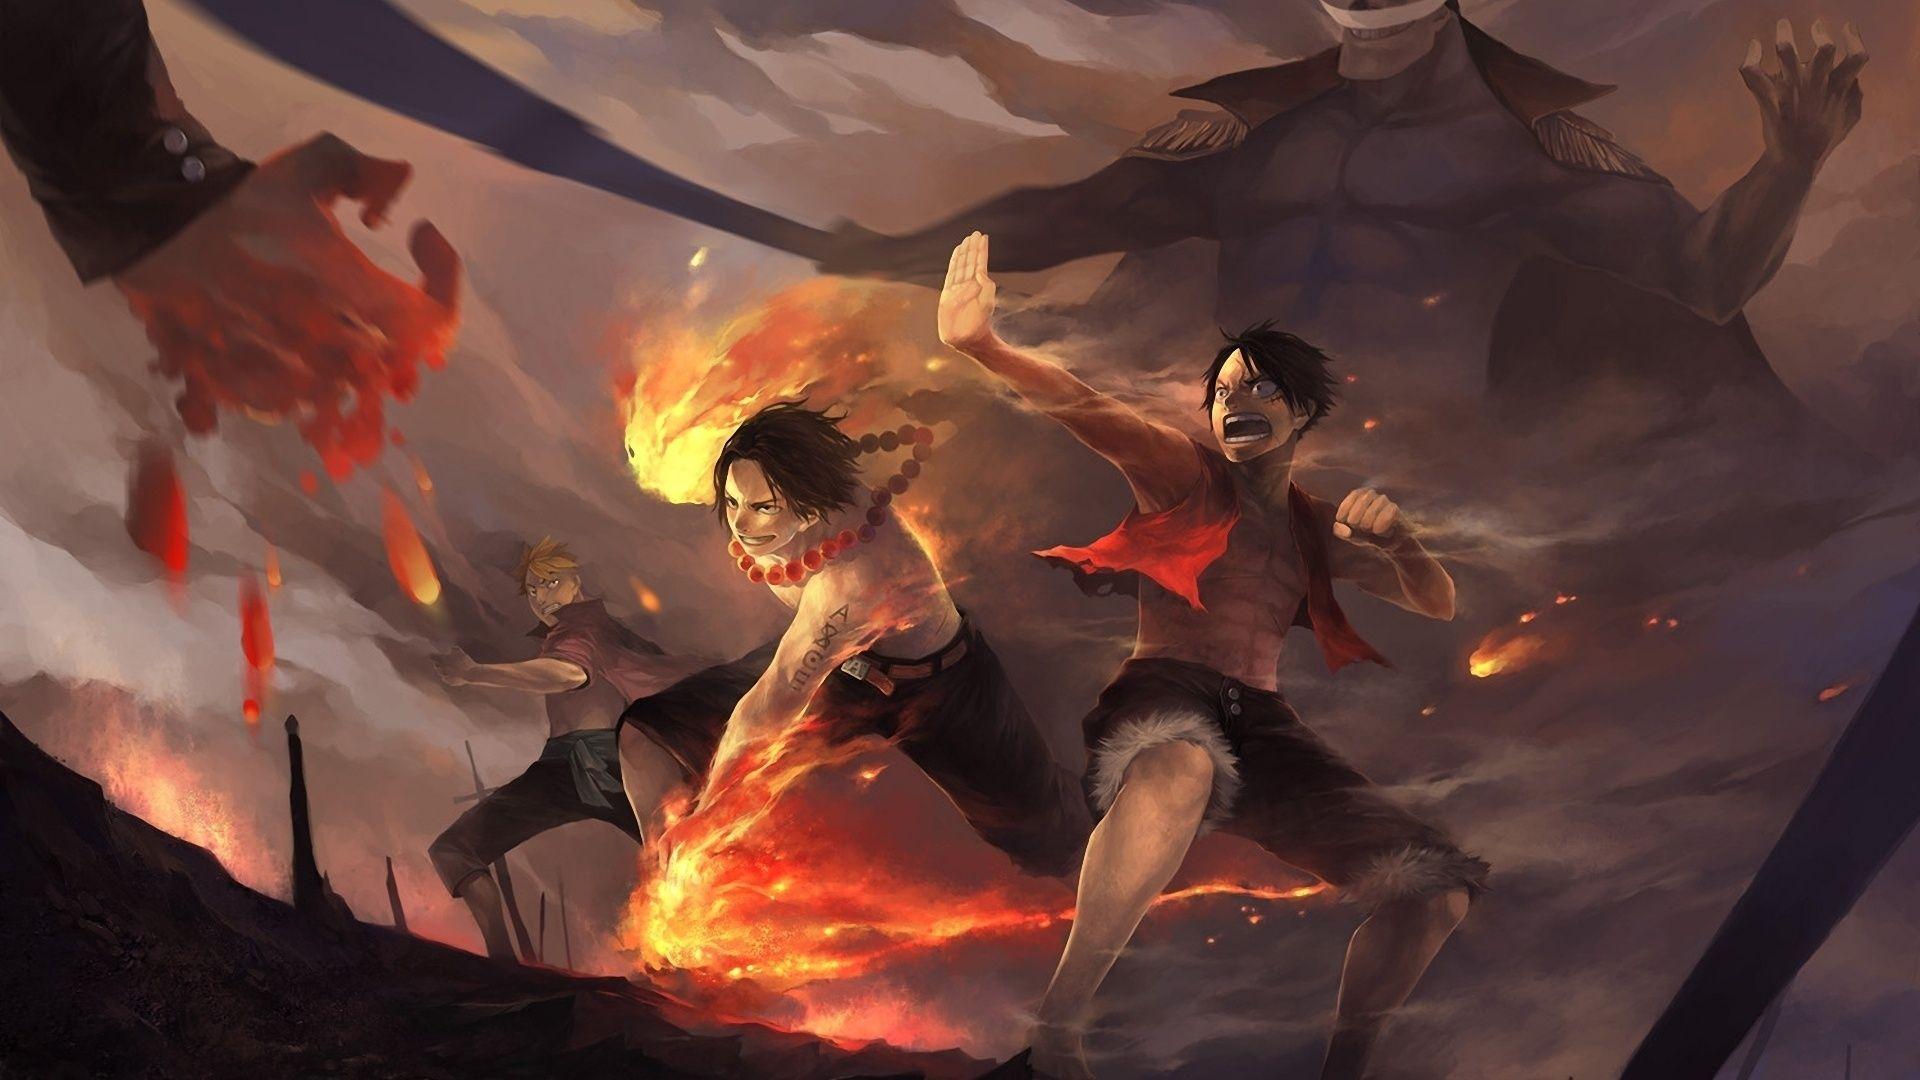 Portgas D Ace And Edward Newgate, Luffy Art Fire